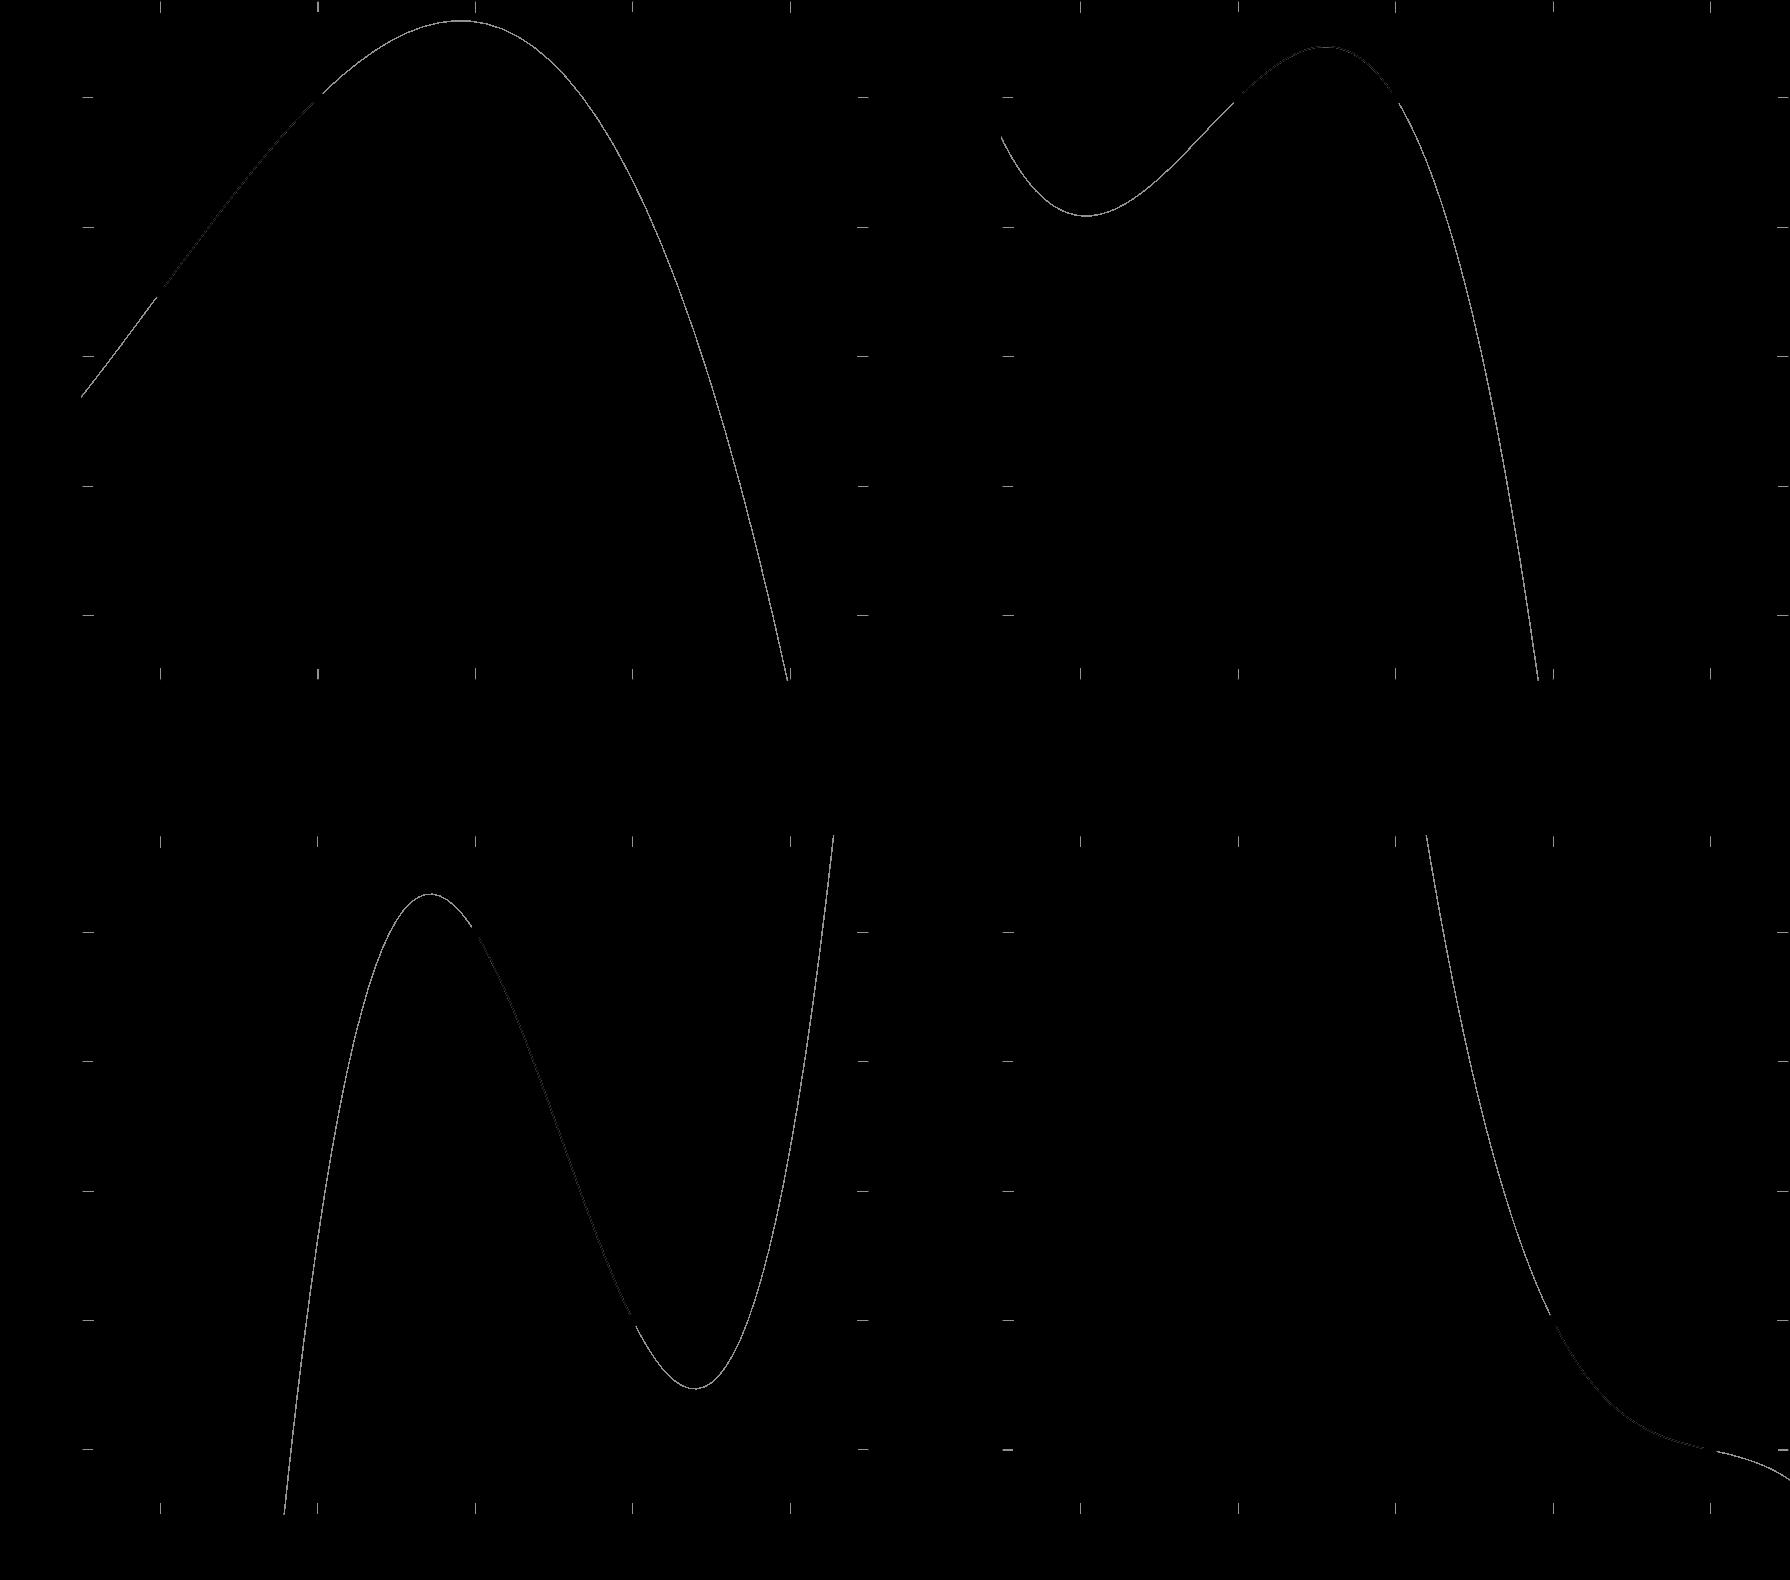 Cubic Spline Interpolation Splines – Timo Denk's Blog